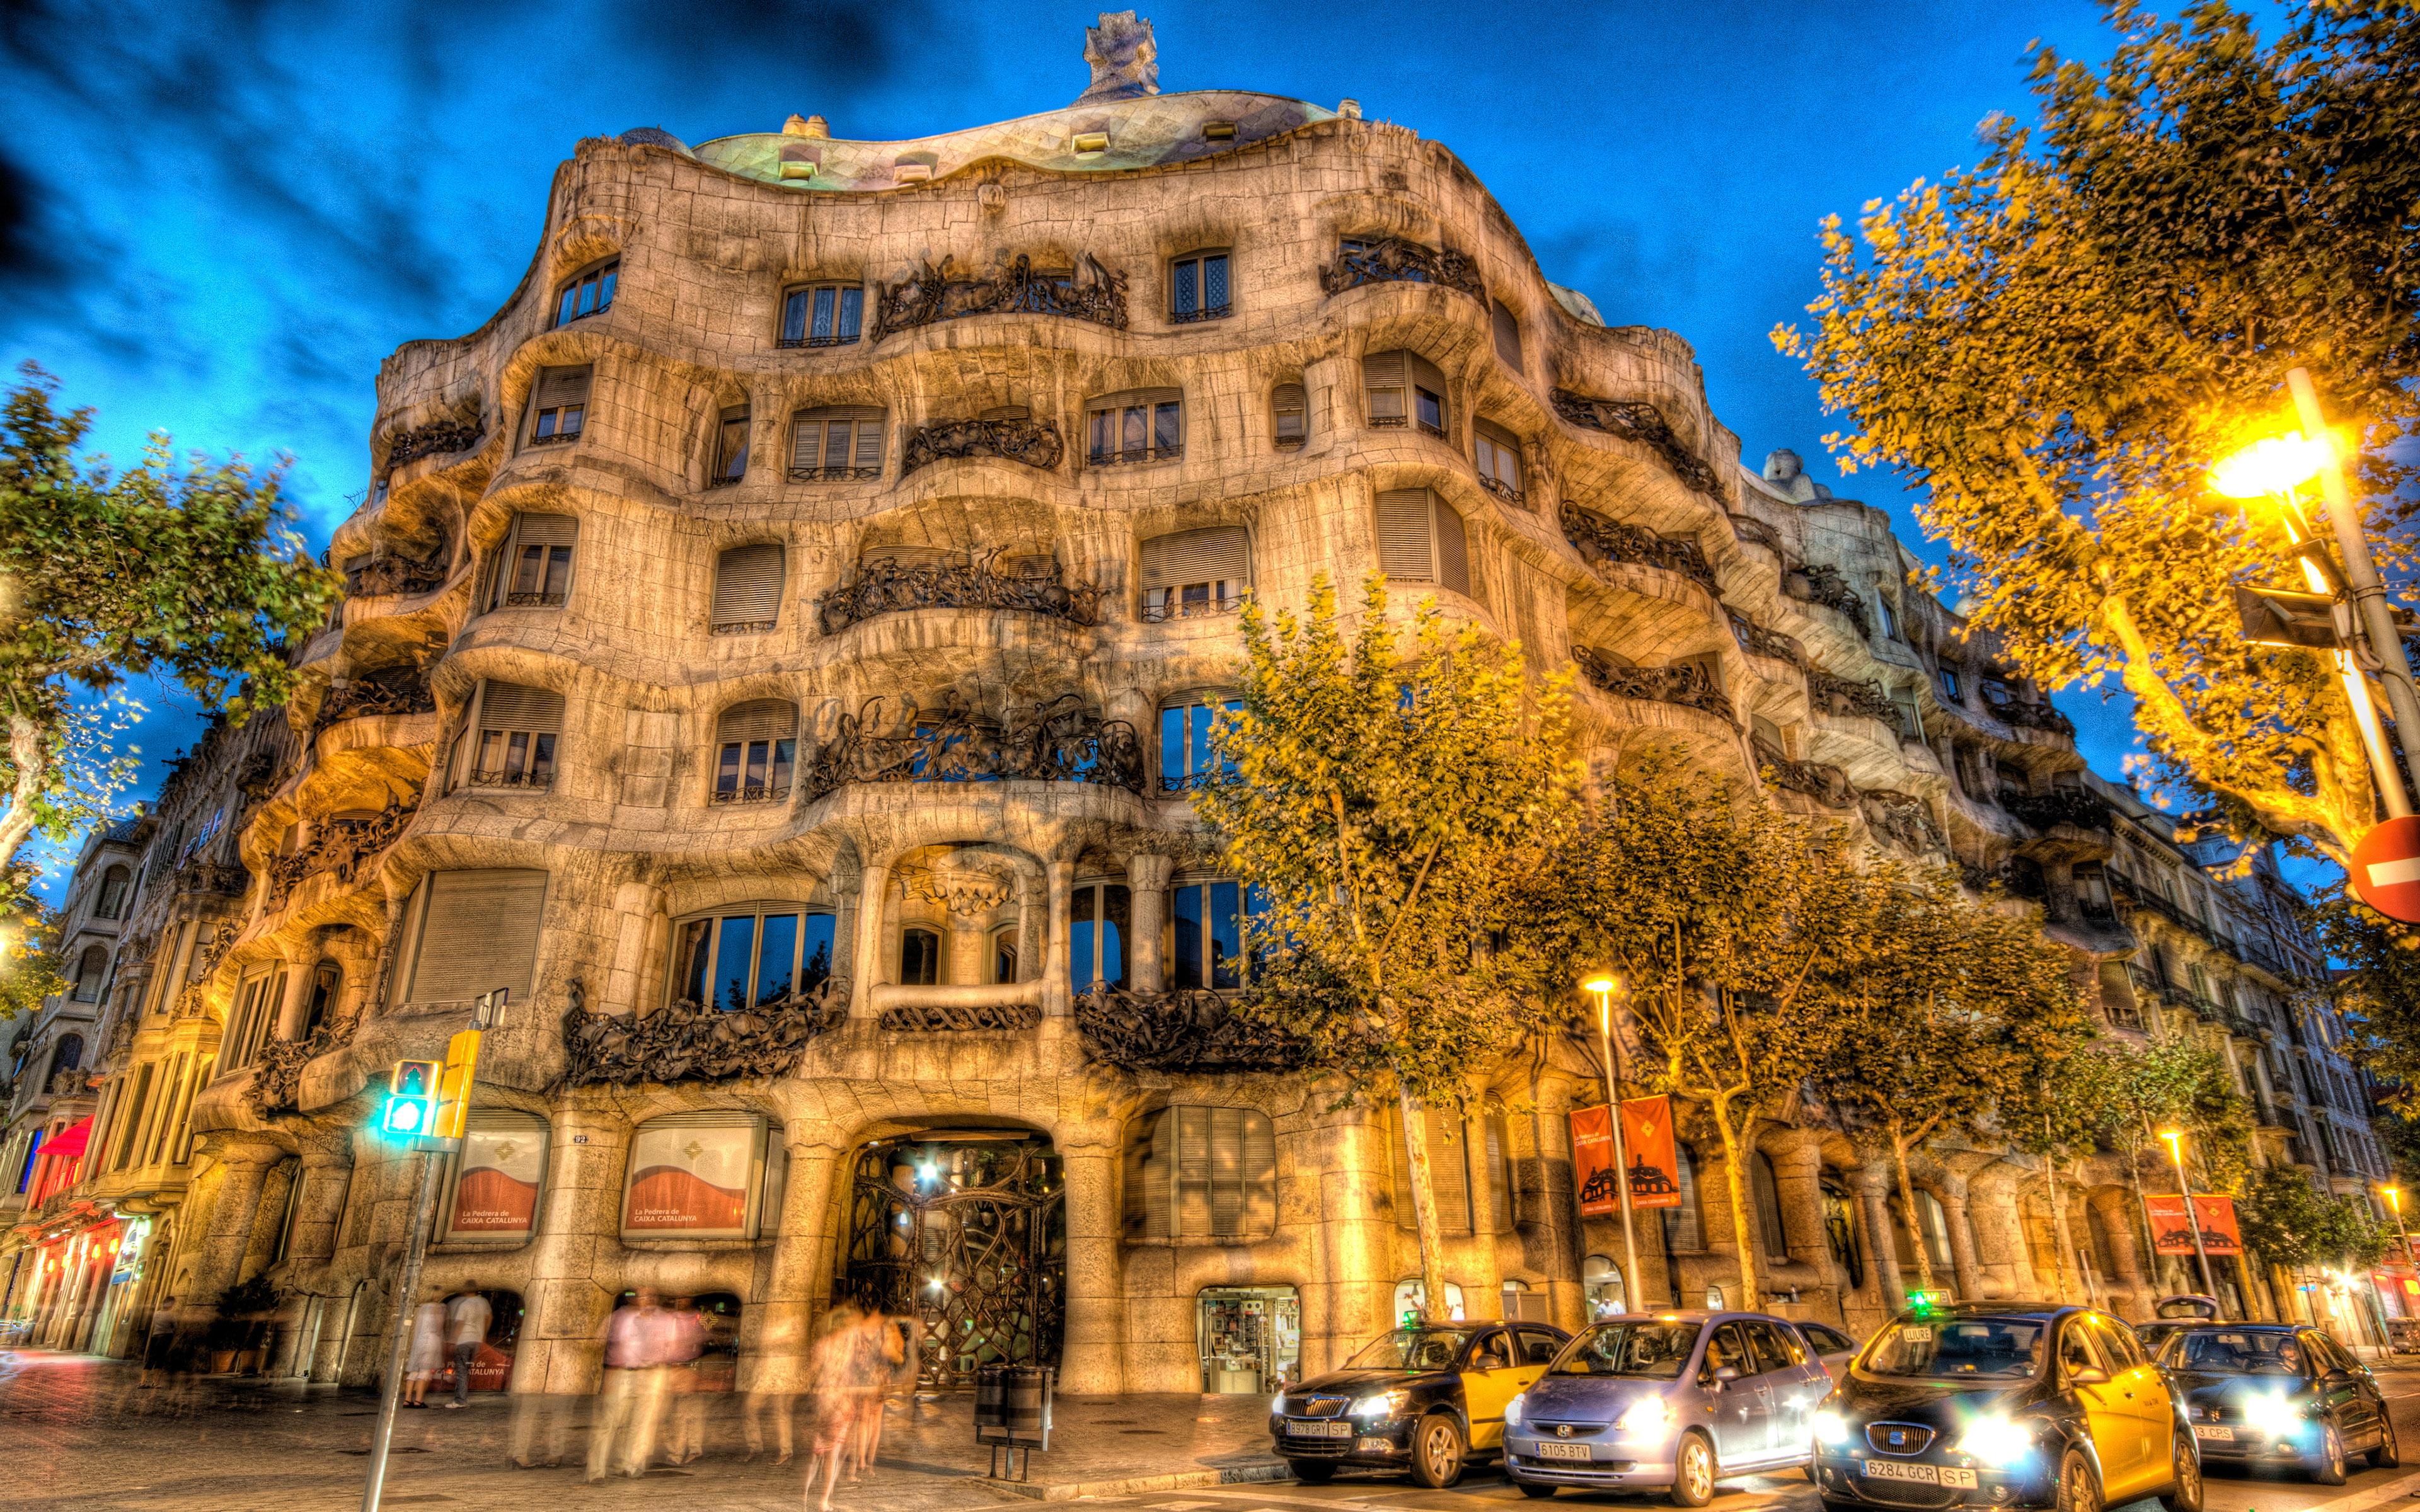 barcelona - photo #27